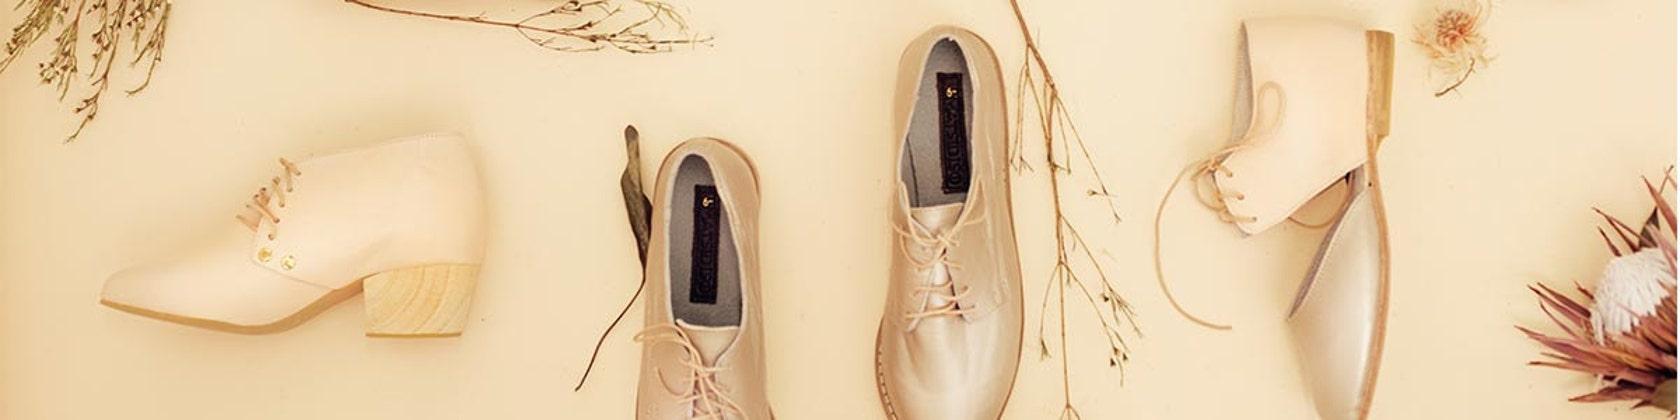 163c5e4c50a6 MATSIDISO Shoes for the Liberated by MatsidisoSA on Etsy